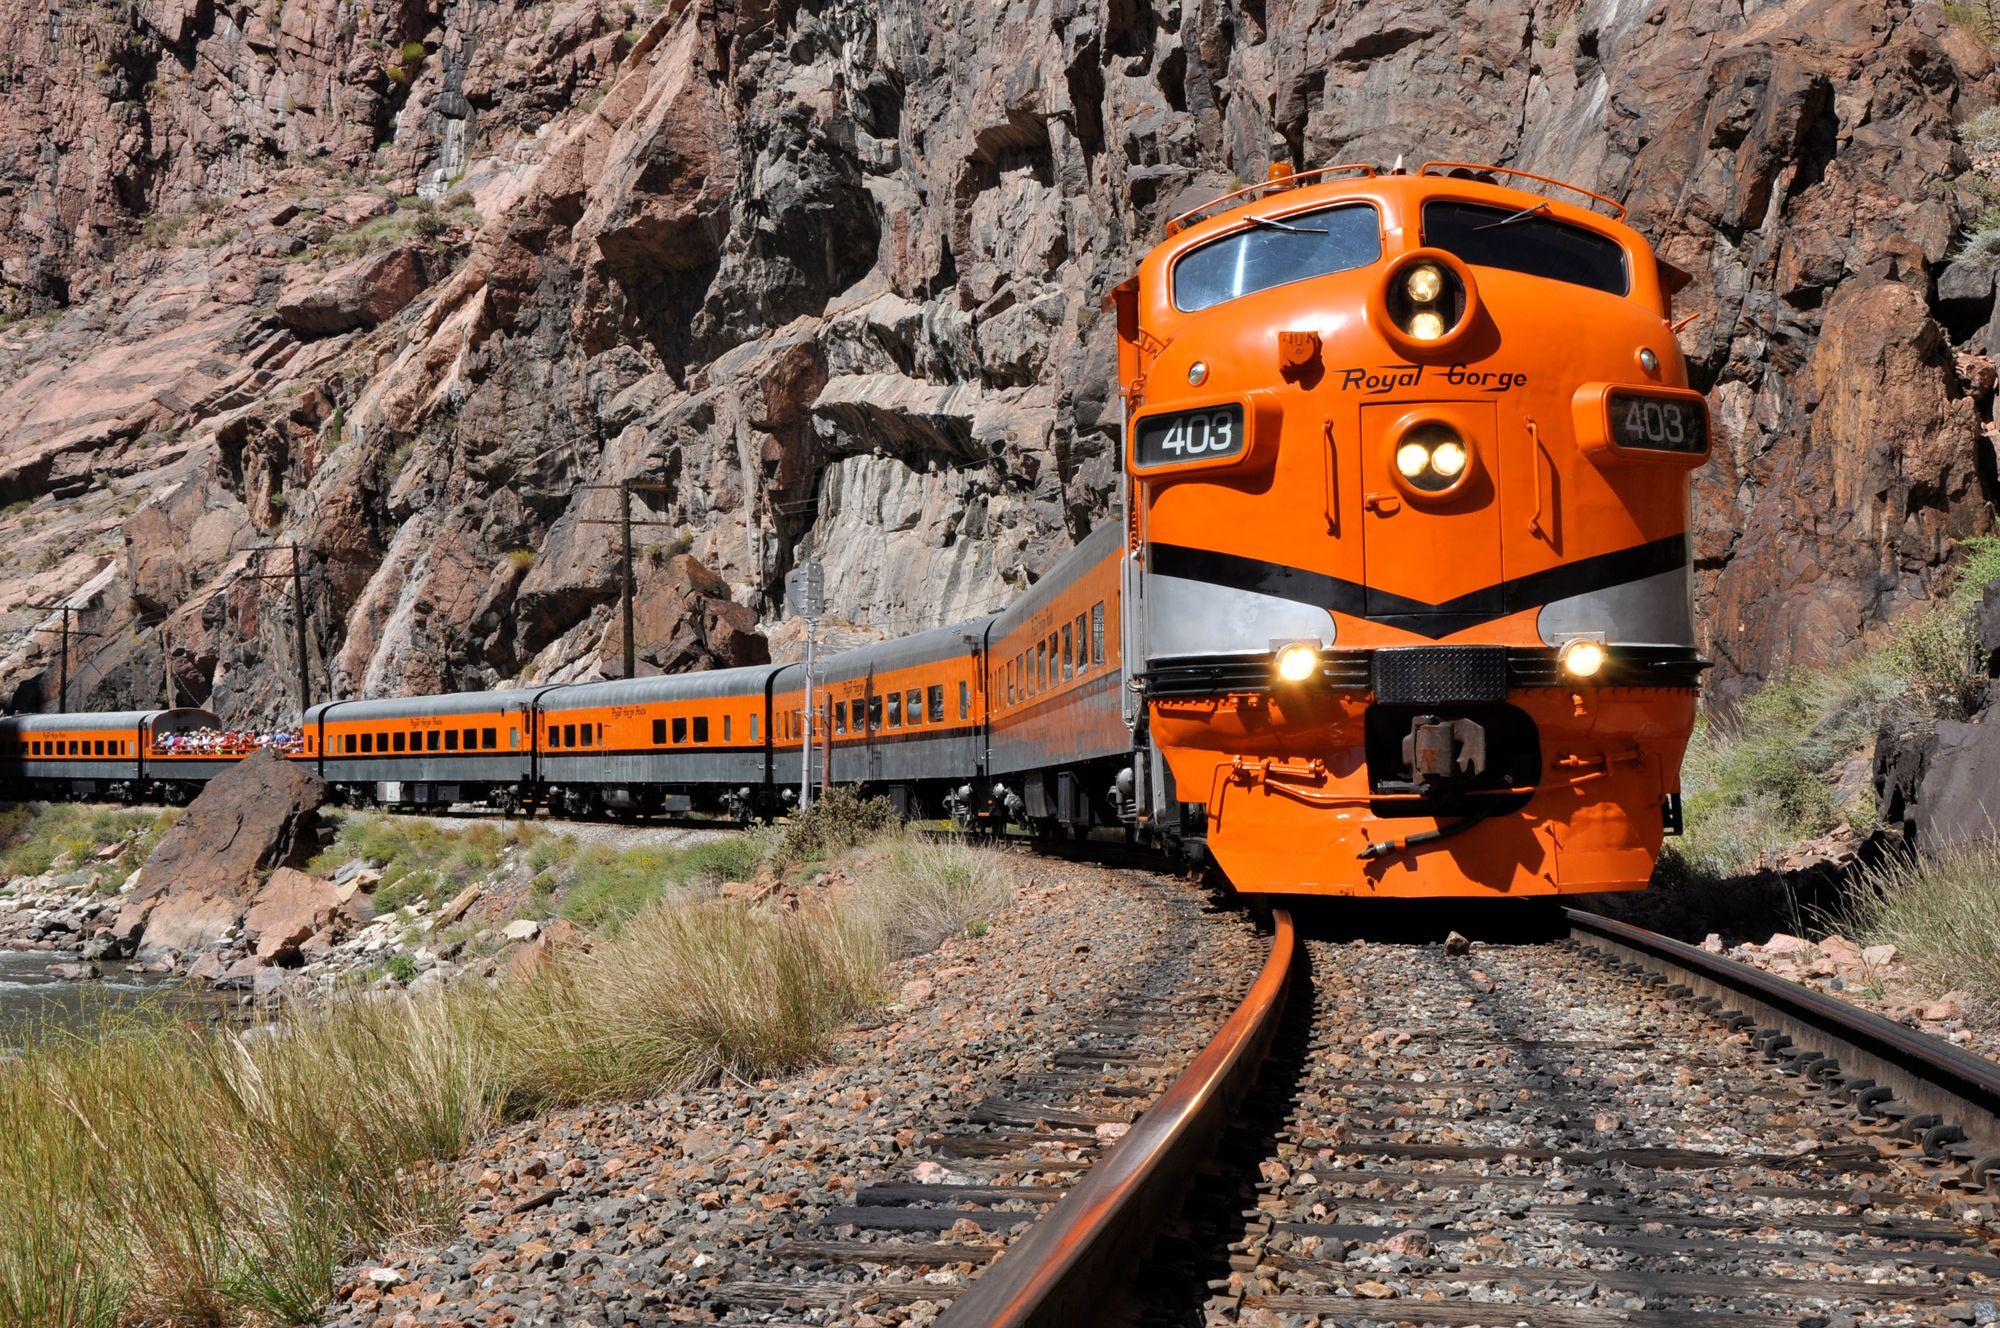 Train to colorado from pa -  Royal Gorge Railroad Near Canon City Colorado